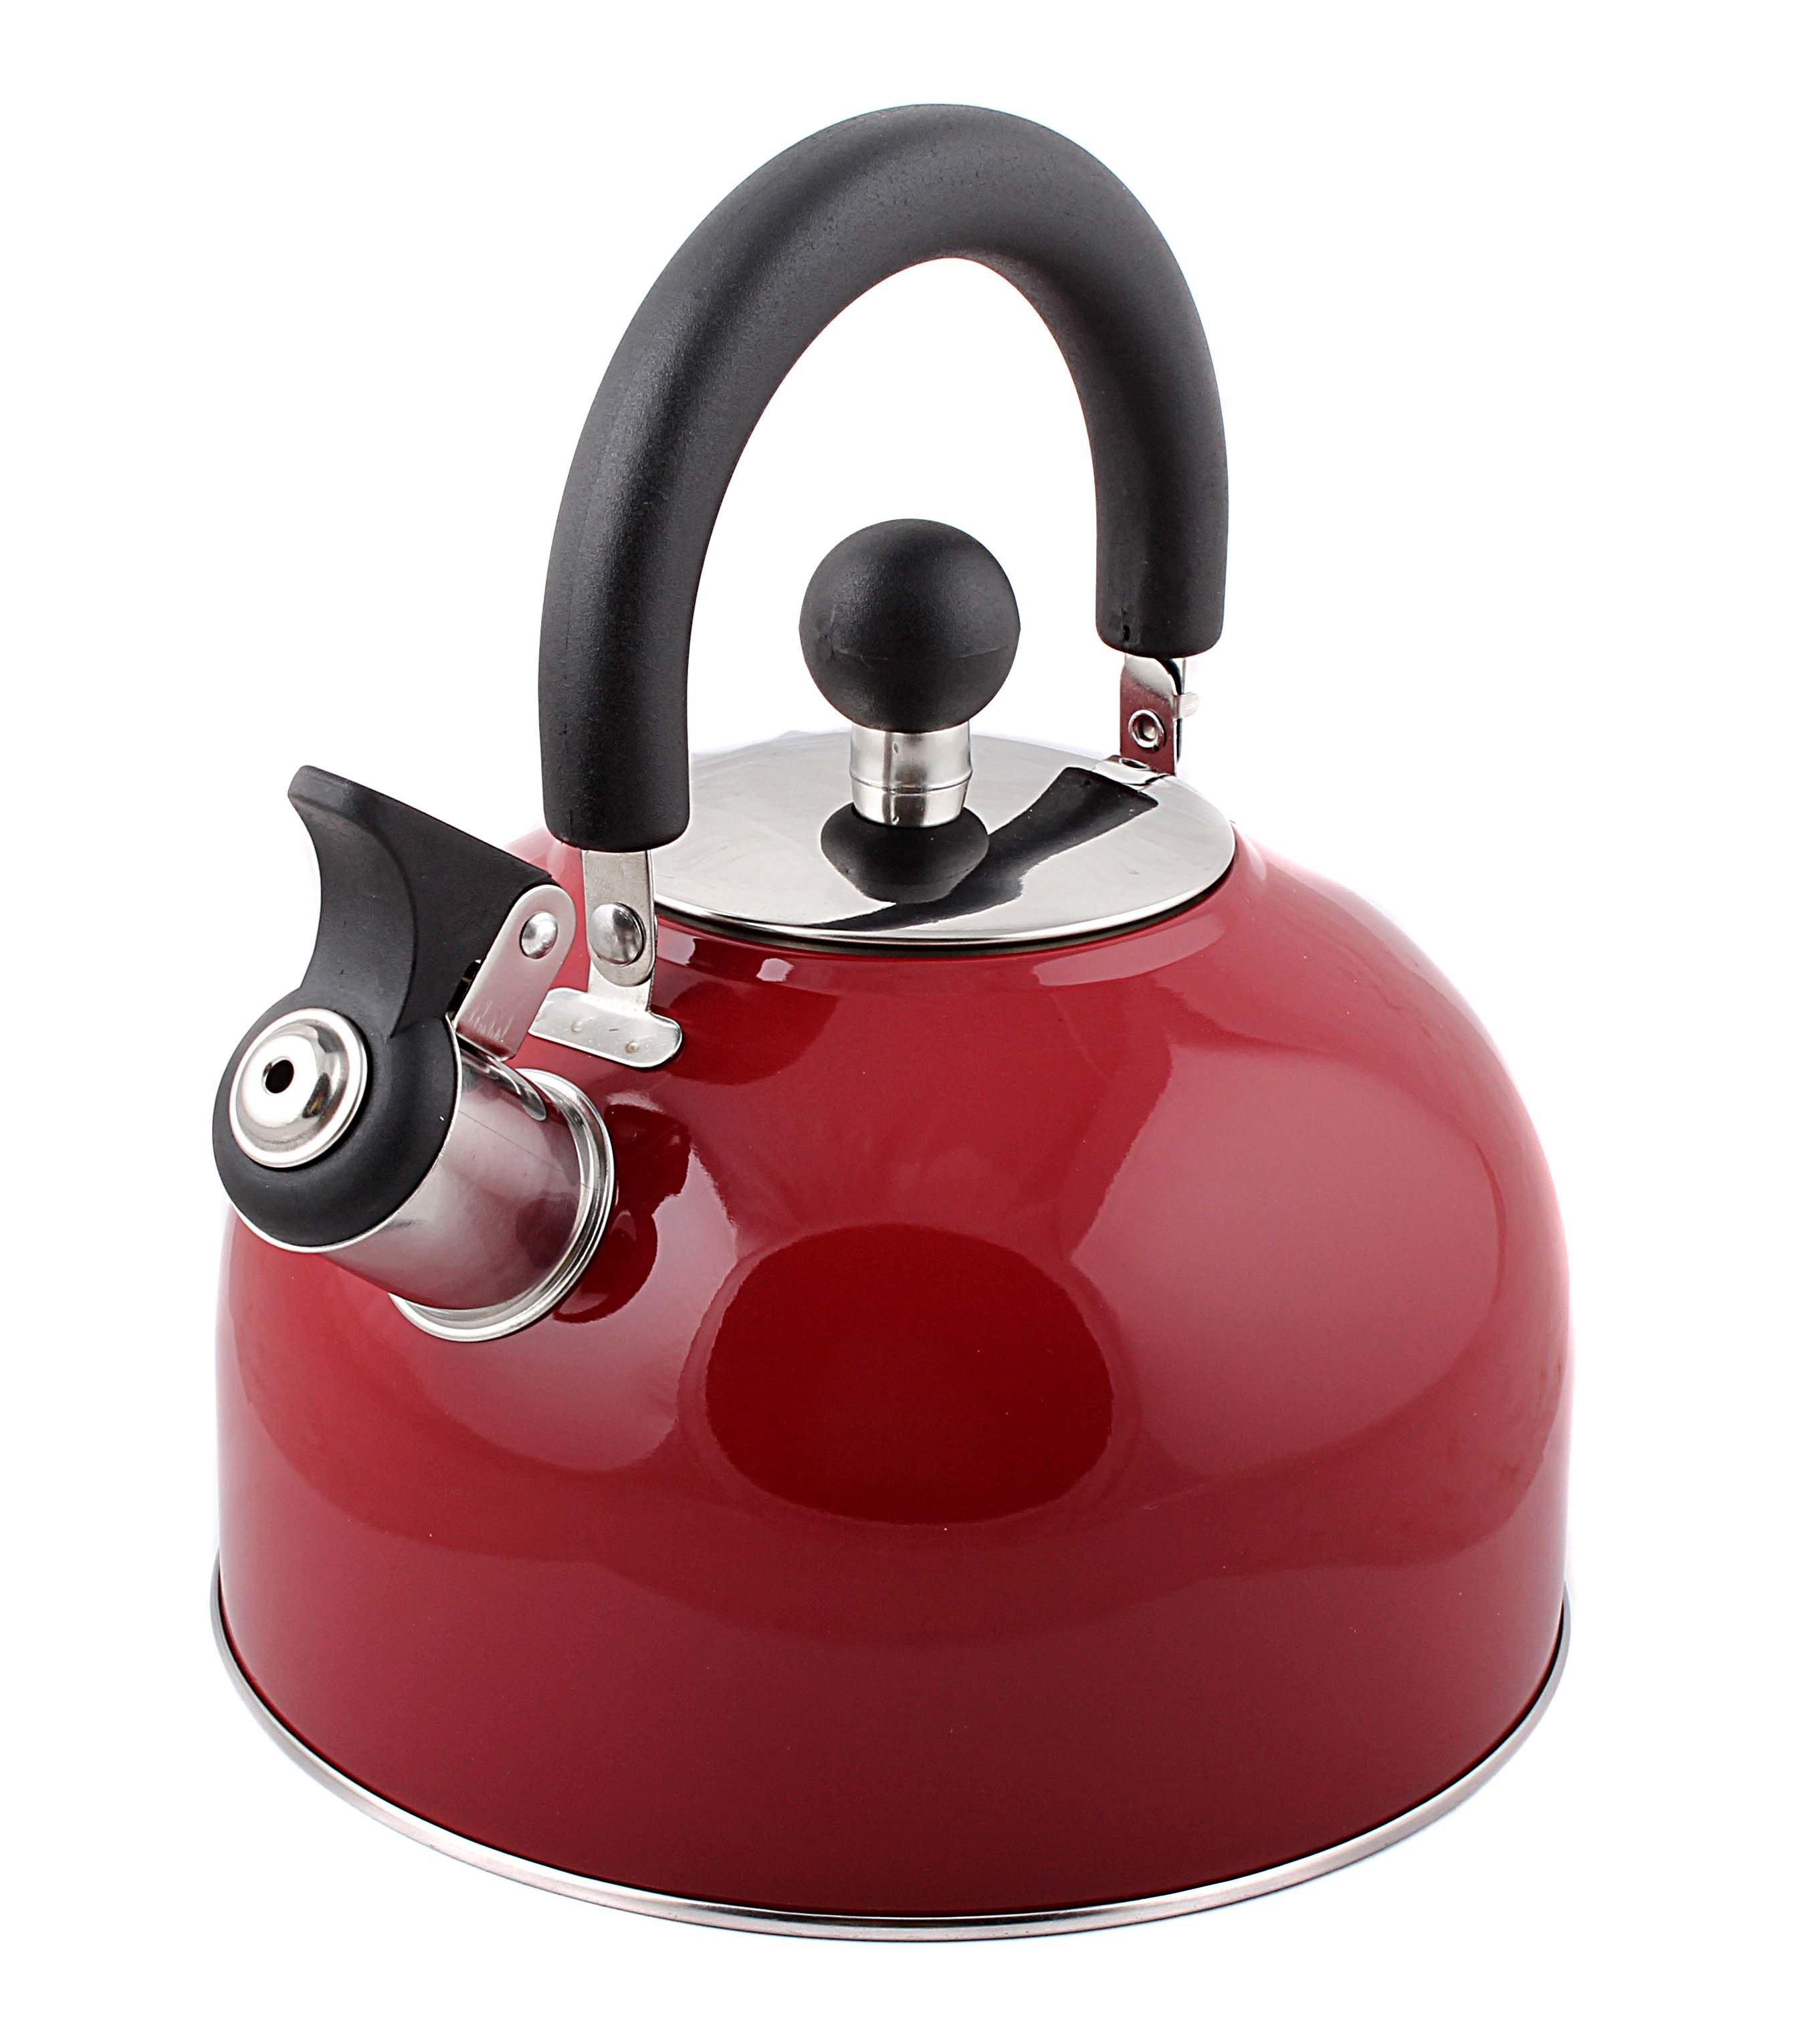 Чайник металлический Mallony 910084 mal-039-r 2.5л